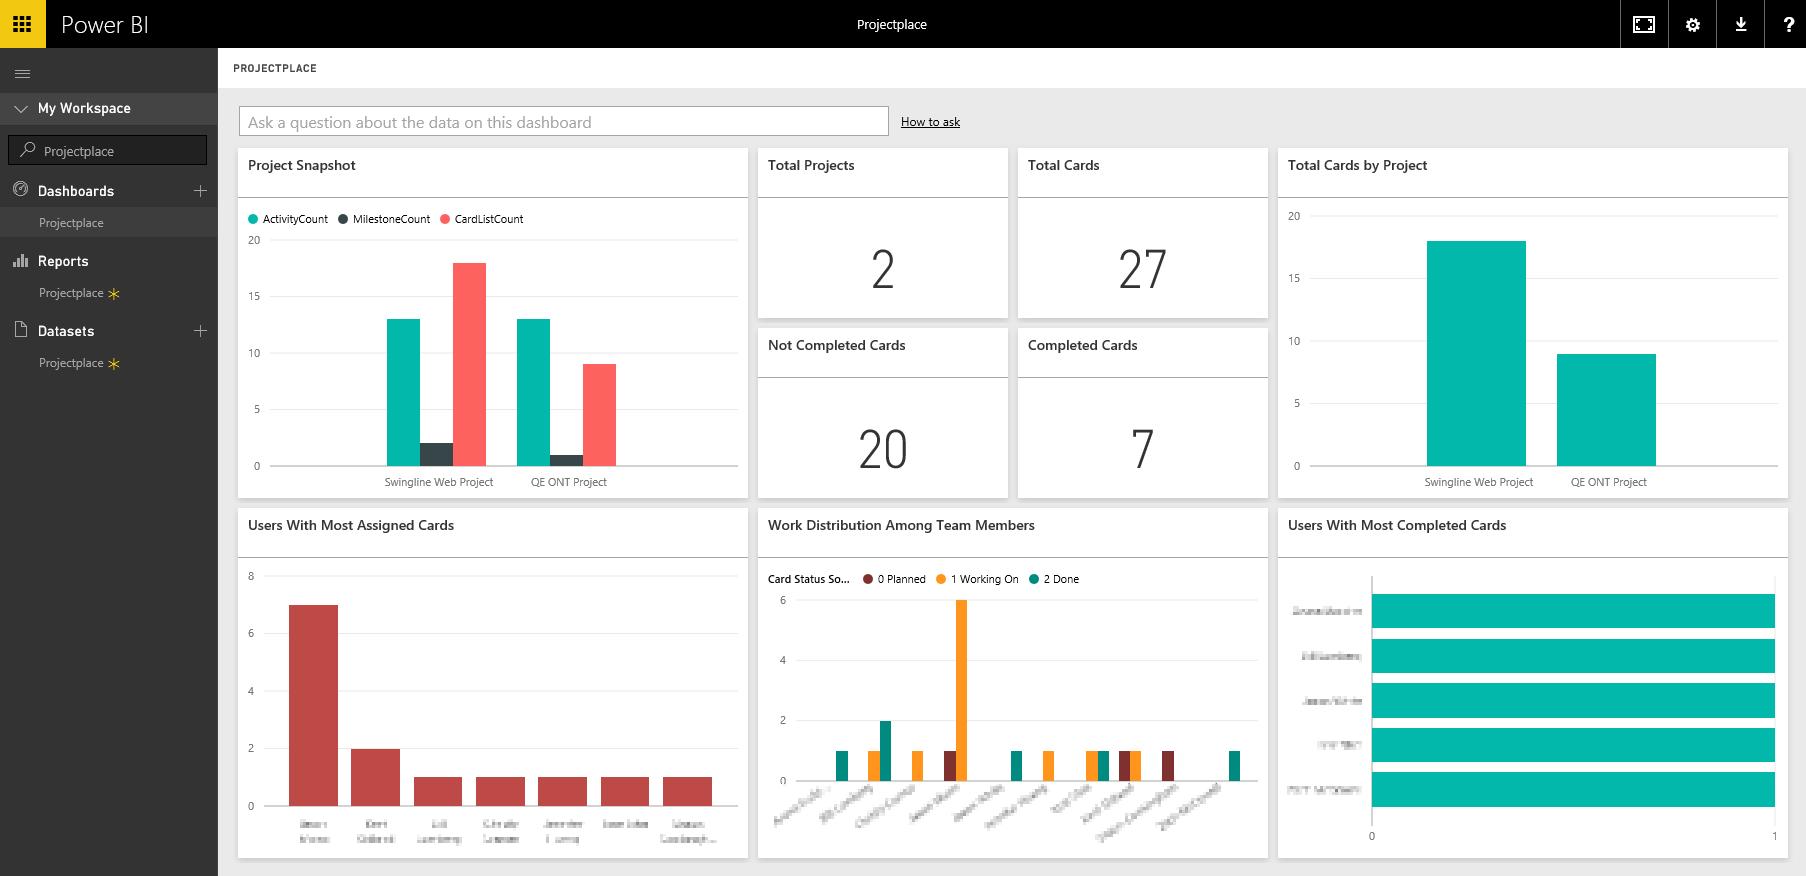 Visualize your Projectplace data in Power BI | Microsoft Power BI